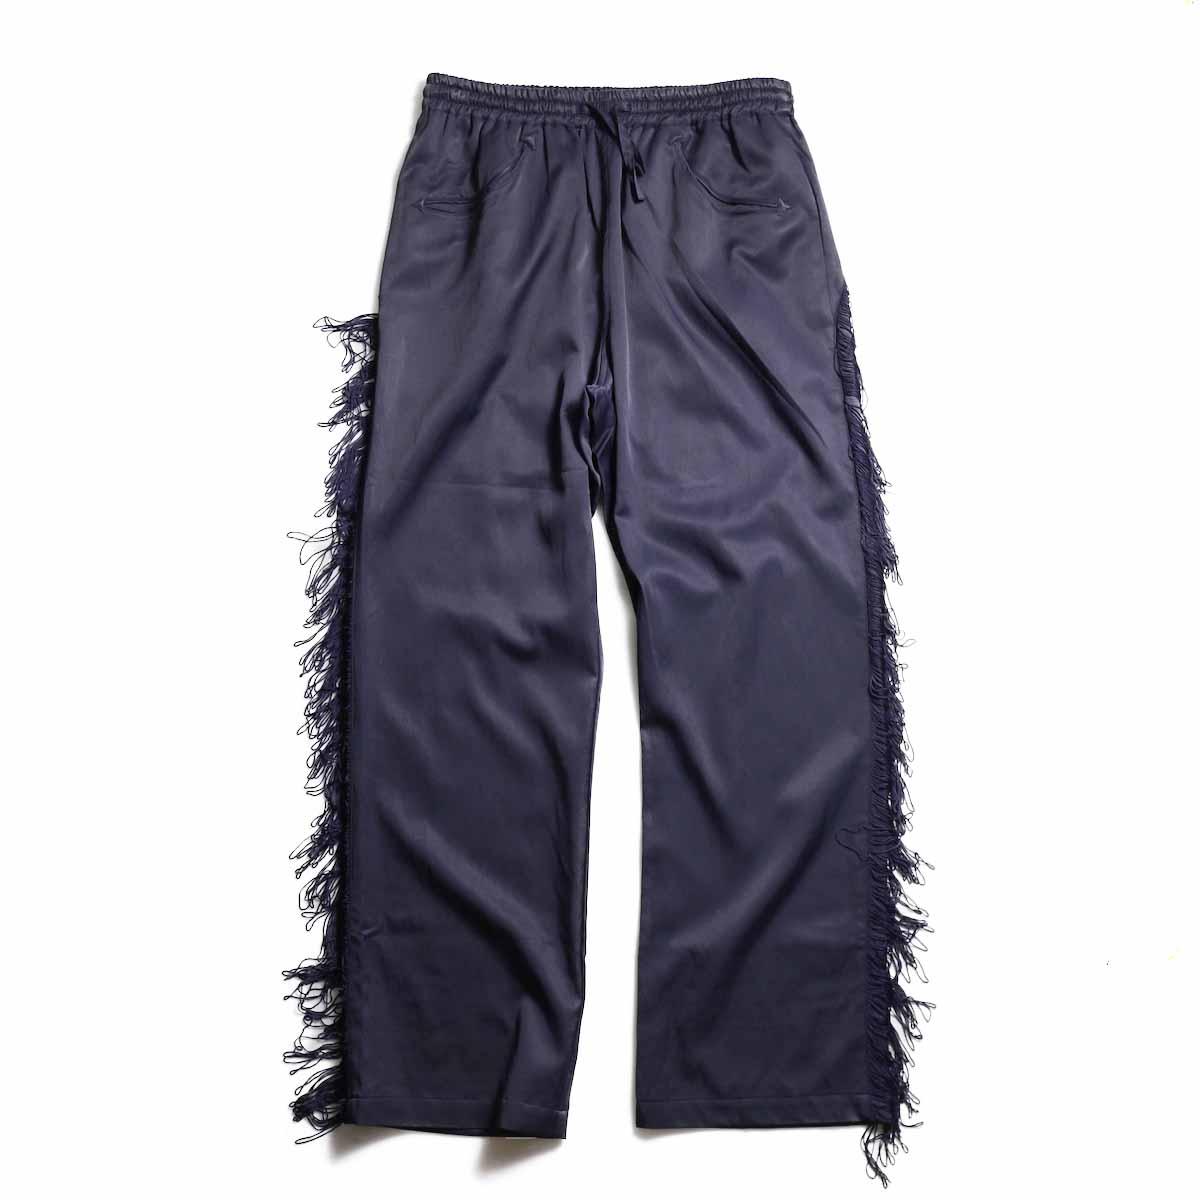 Needles / Fringe Cowboy Pant -R/C Twill Sateen (Purple)